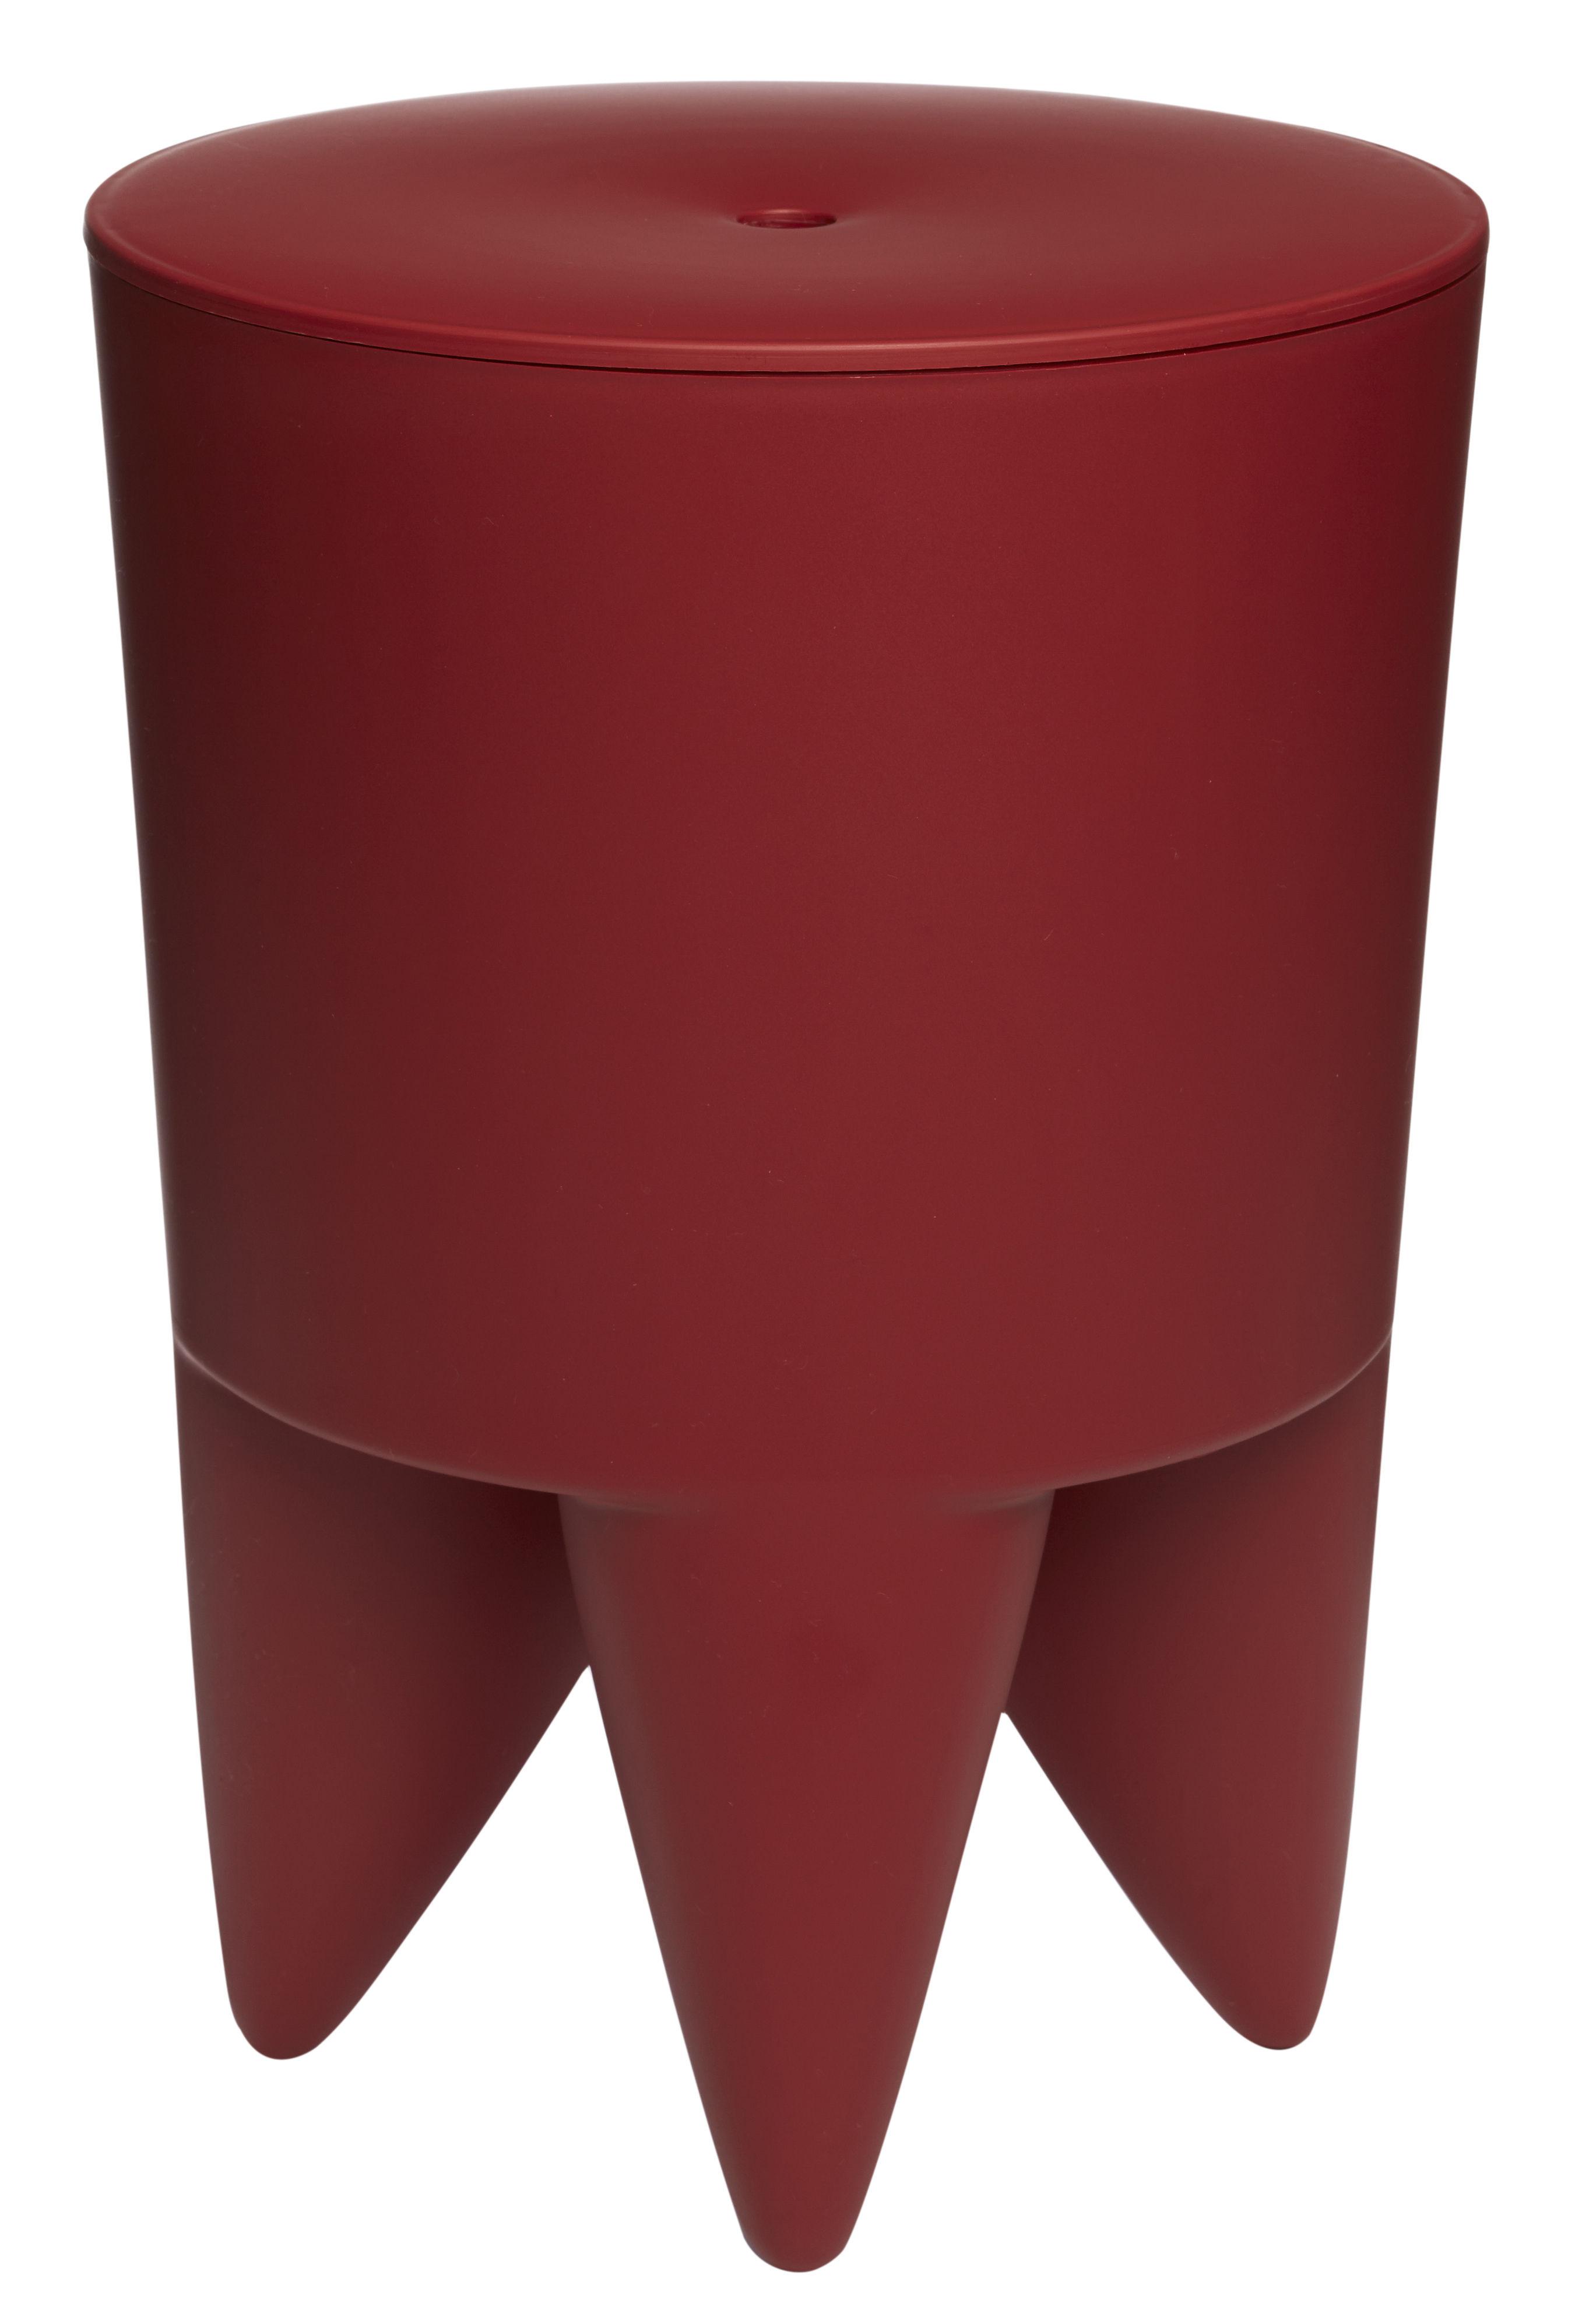 Mobilier - Tabourets bas - Tabouret New Bubu 1er Coffre - Plastique - XO - Marsala - Polypropylène